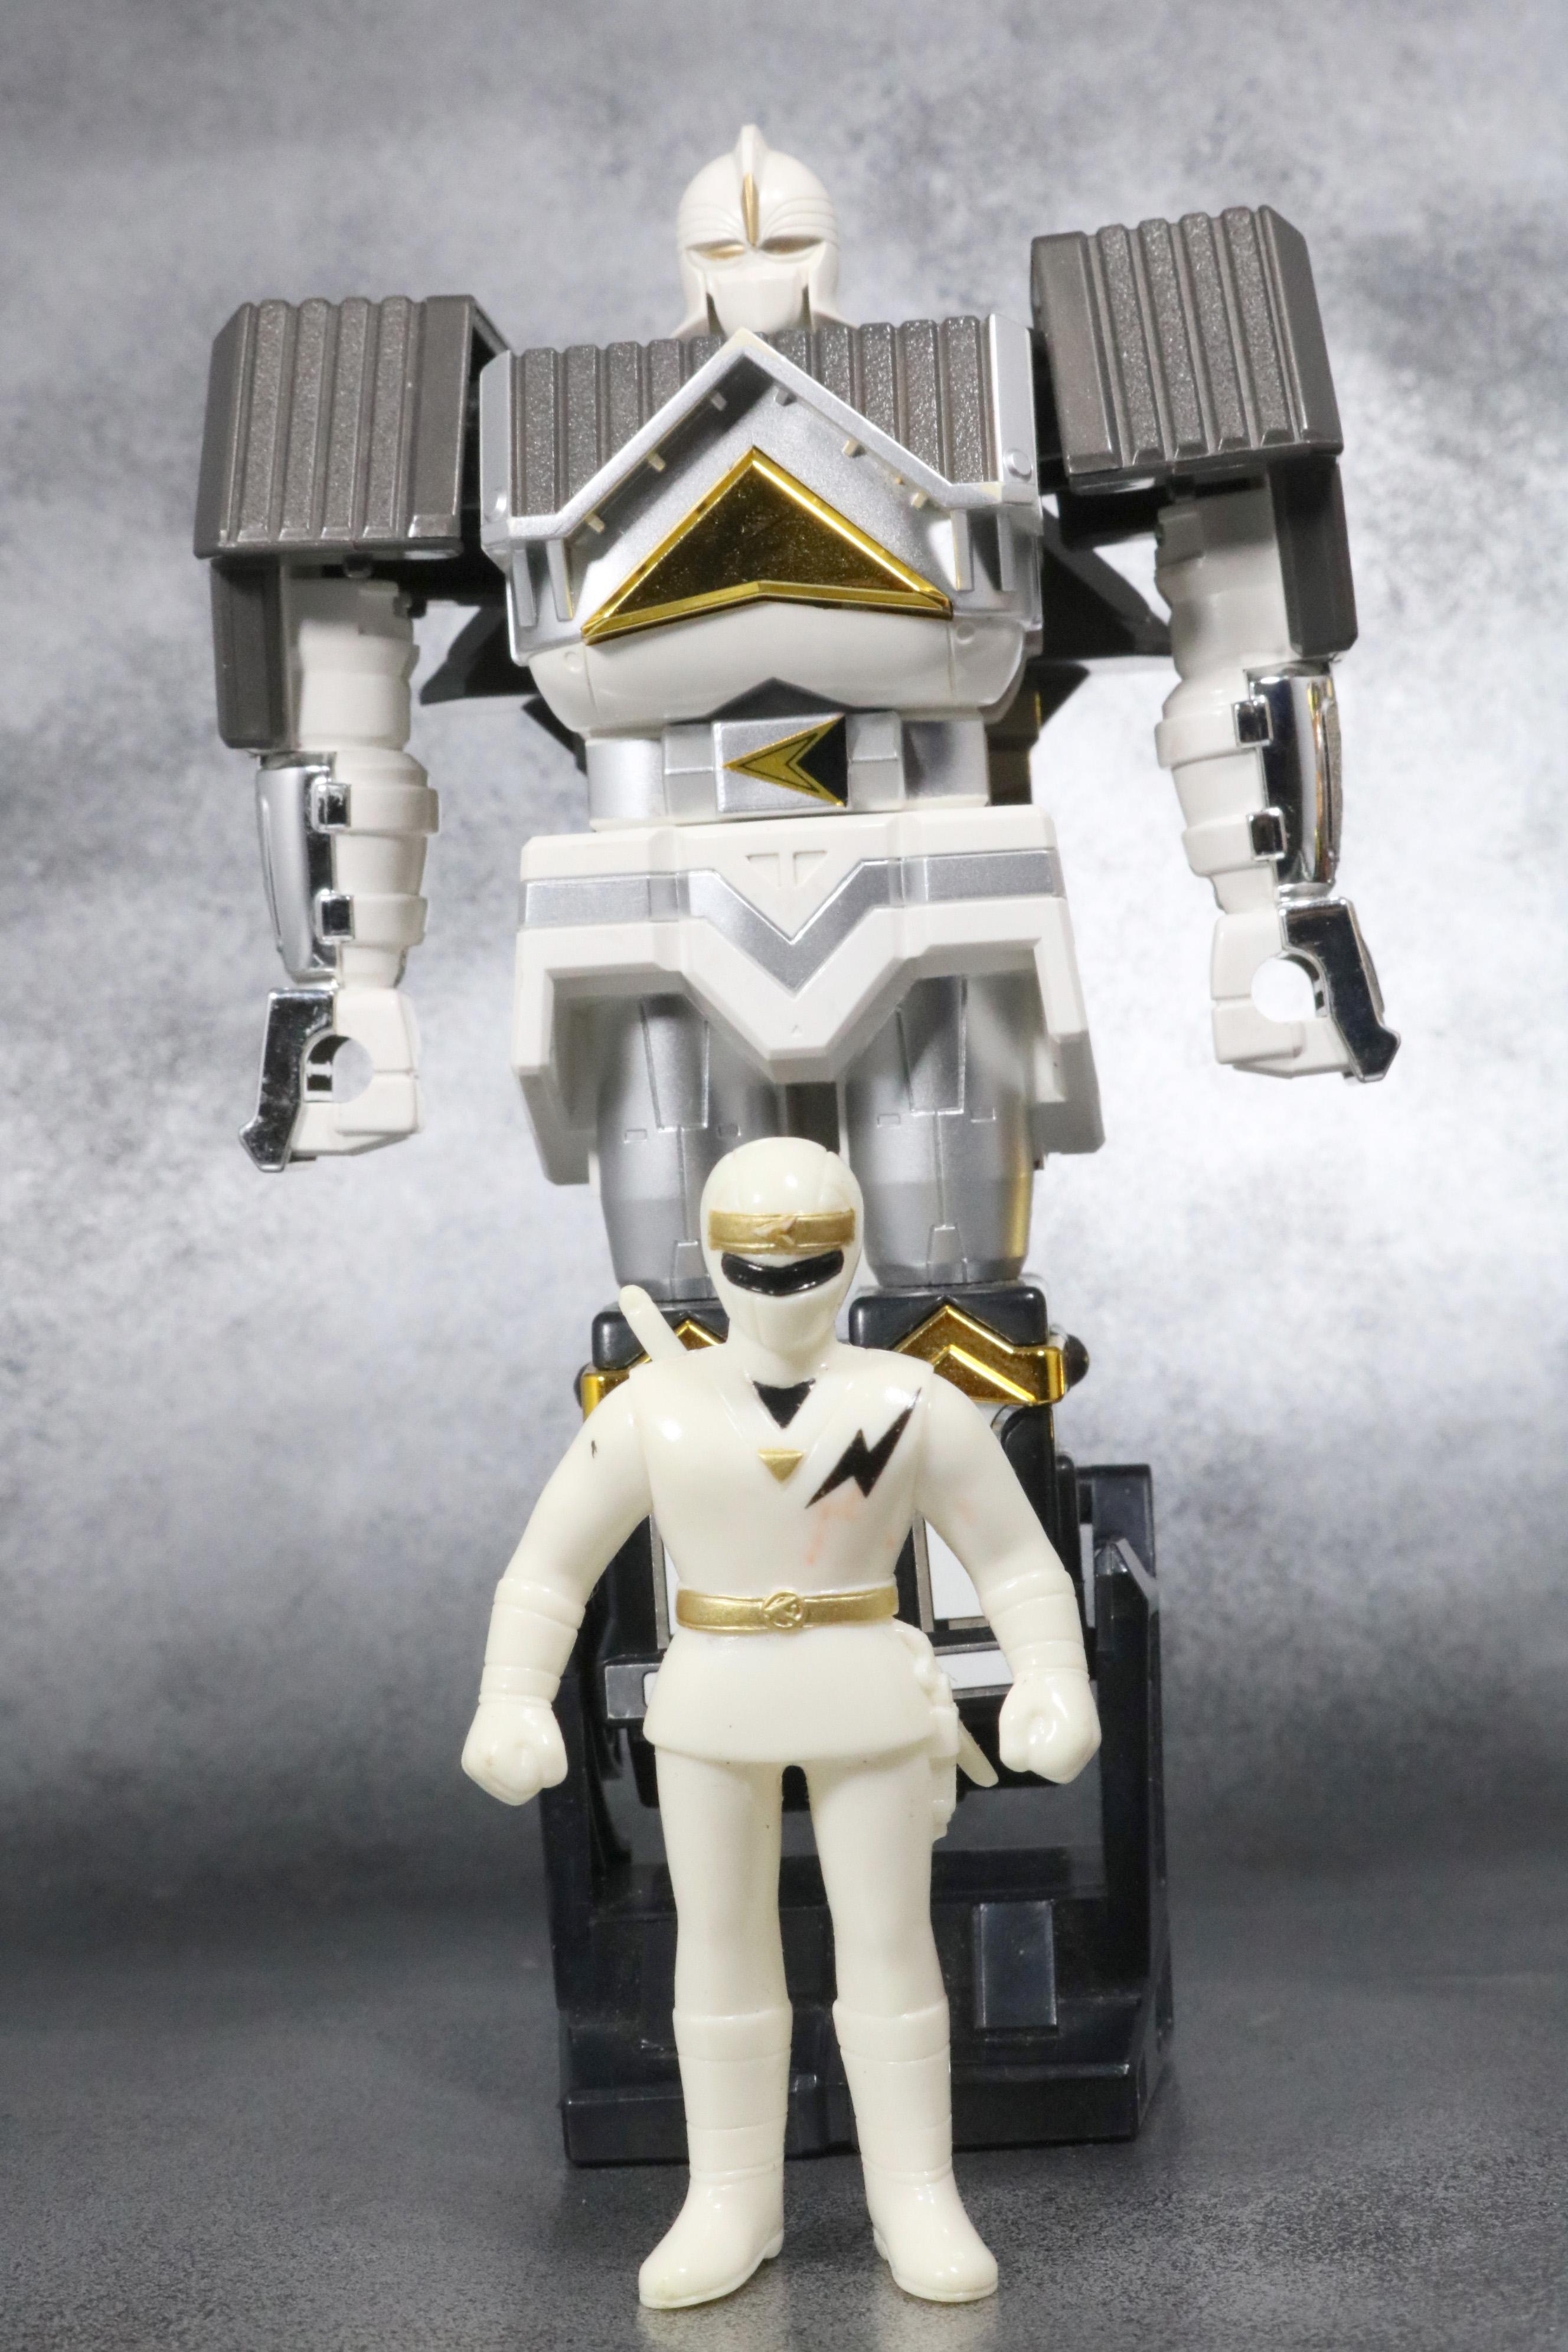 DX 無敵将軍 レビュー ホワイトカーク アクション